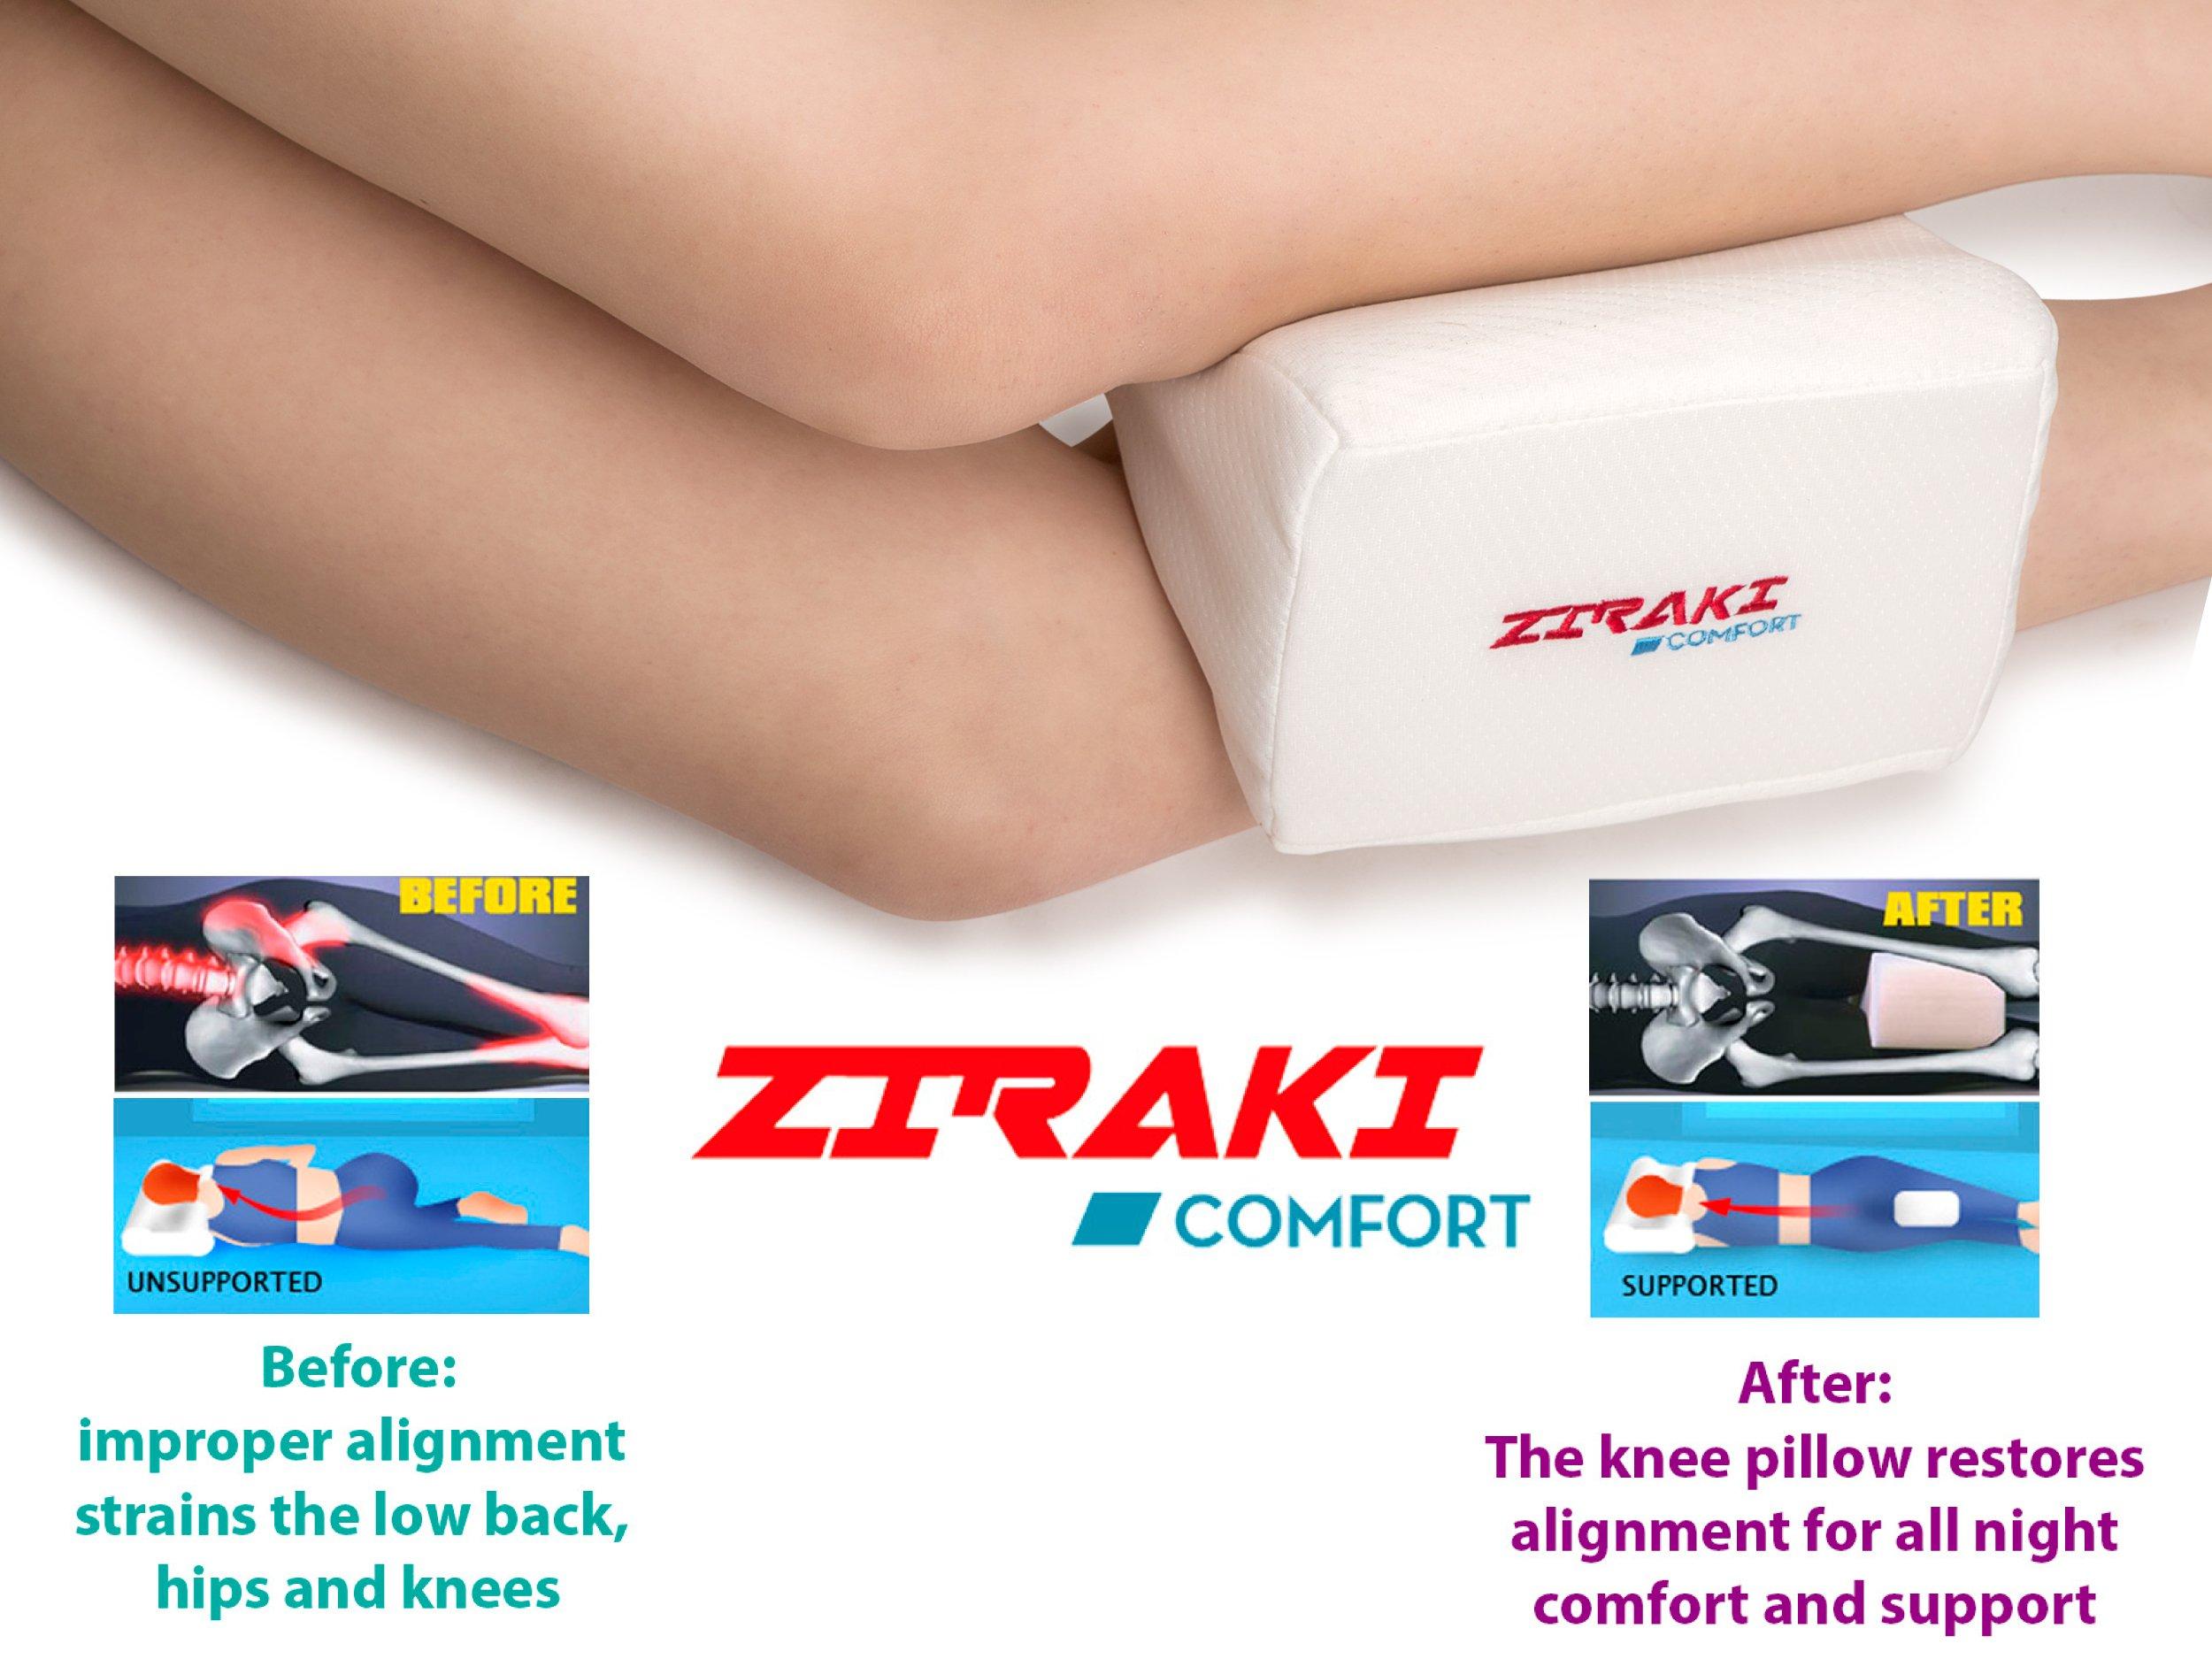 Ziraki Memory Foam Wedge Contour Orthopedic Knee Pillow